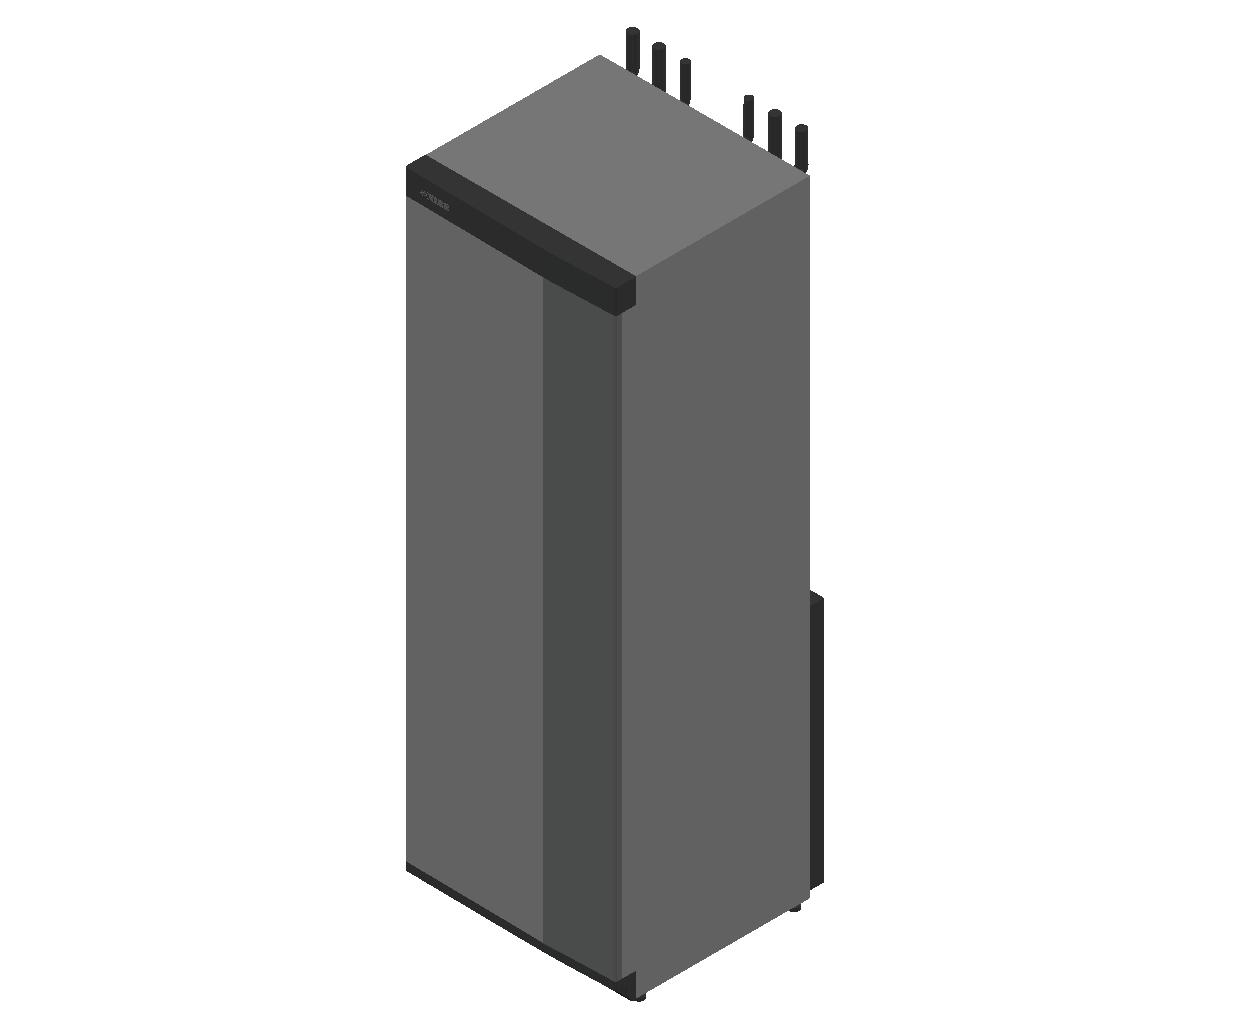 HC_Heat Pump_MEPcontent_NIBE_S1255-16 3x400V_INT-EN.dwg